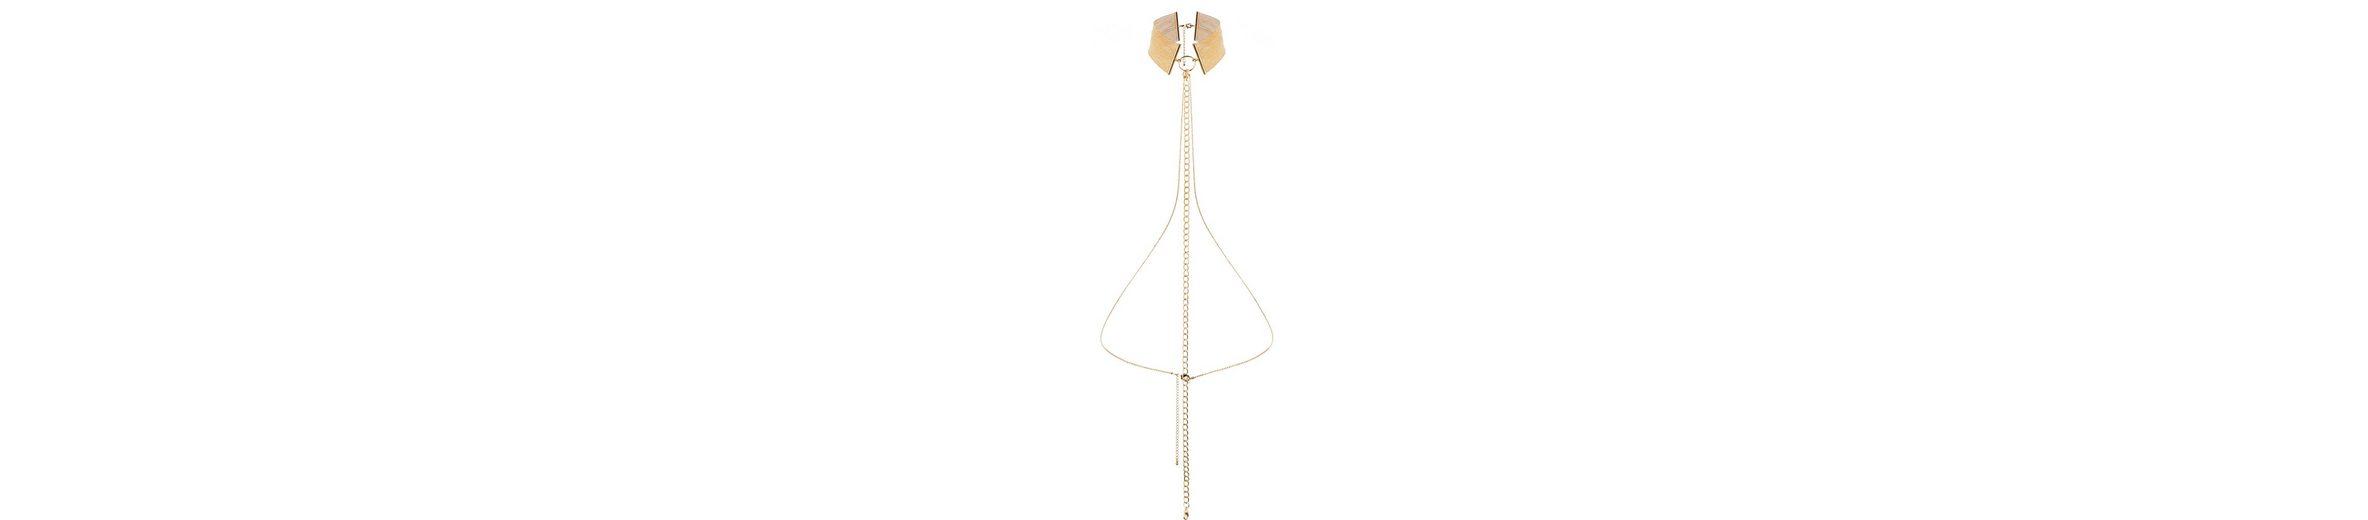 Bijoux Indiscrets Körperschmuck »Magnifique Collar«